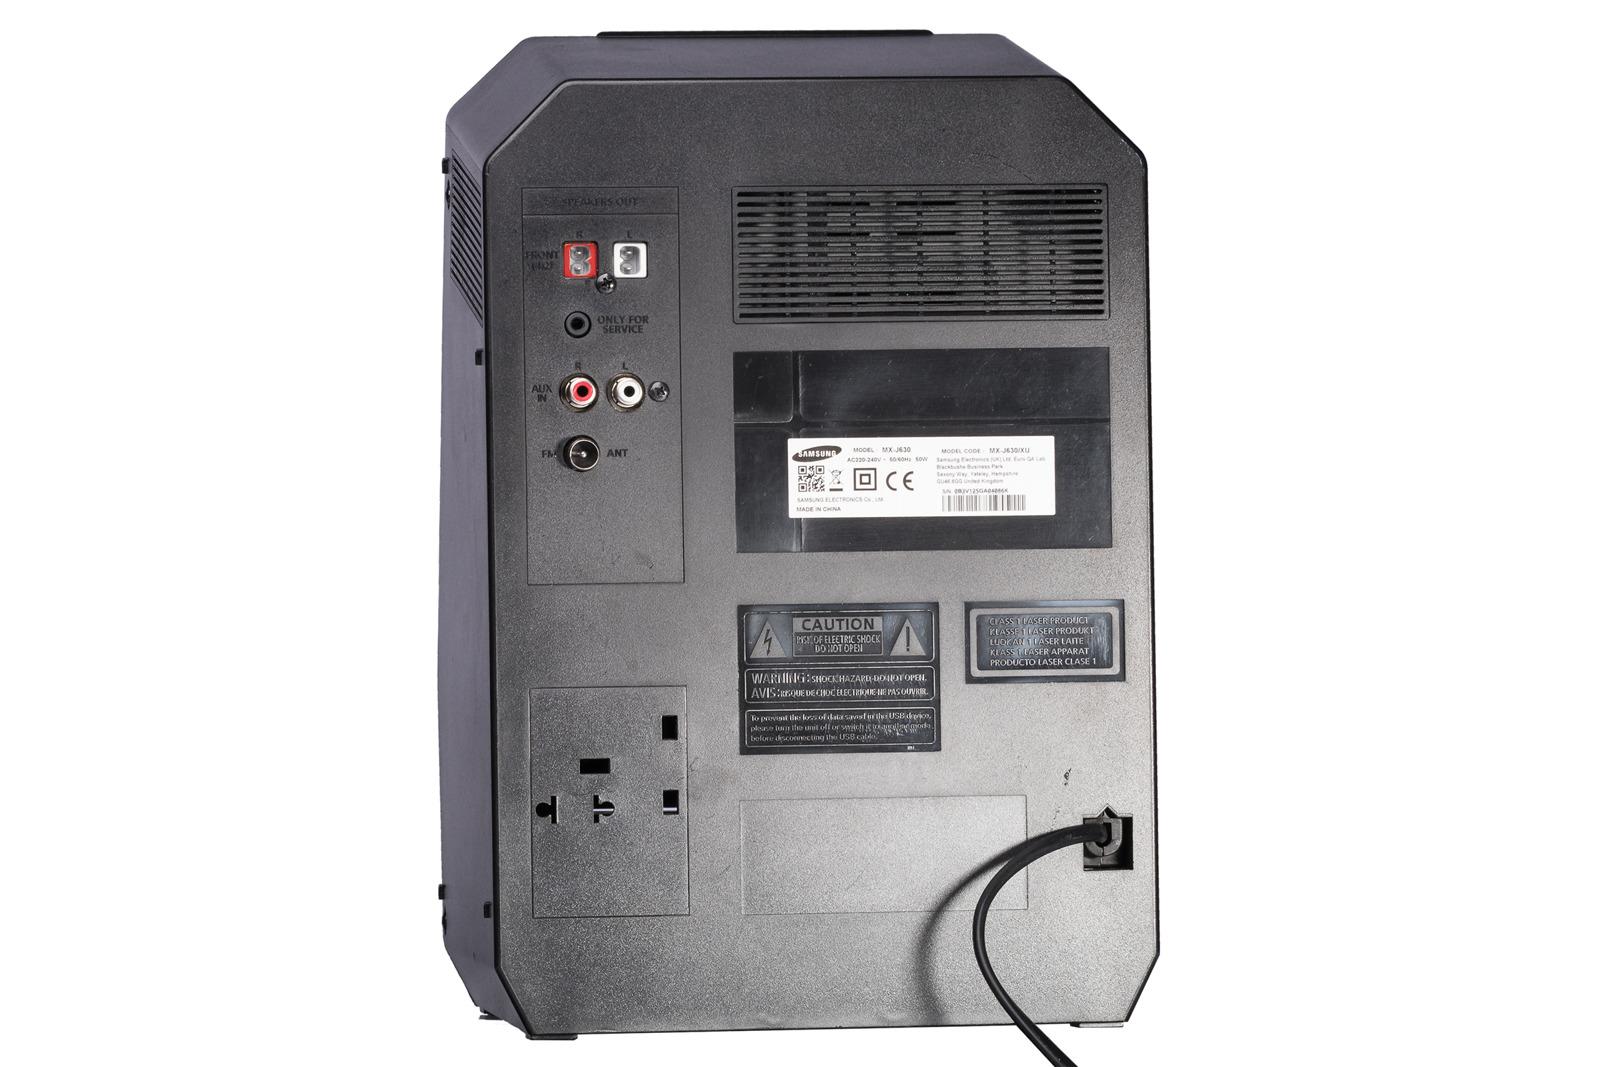 Giga System Samsung MX-J730 600W 2Ch Grade C